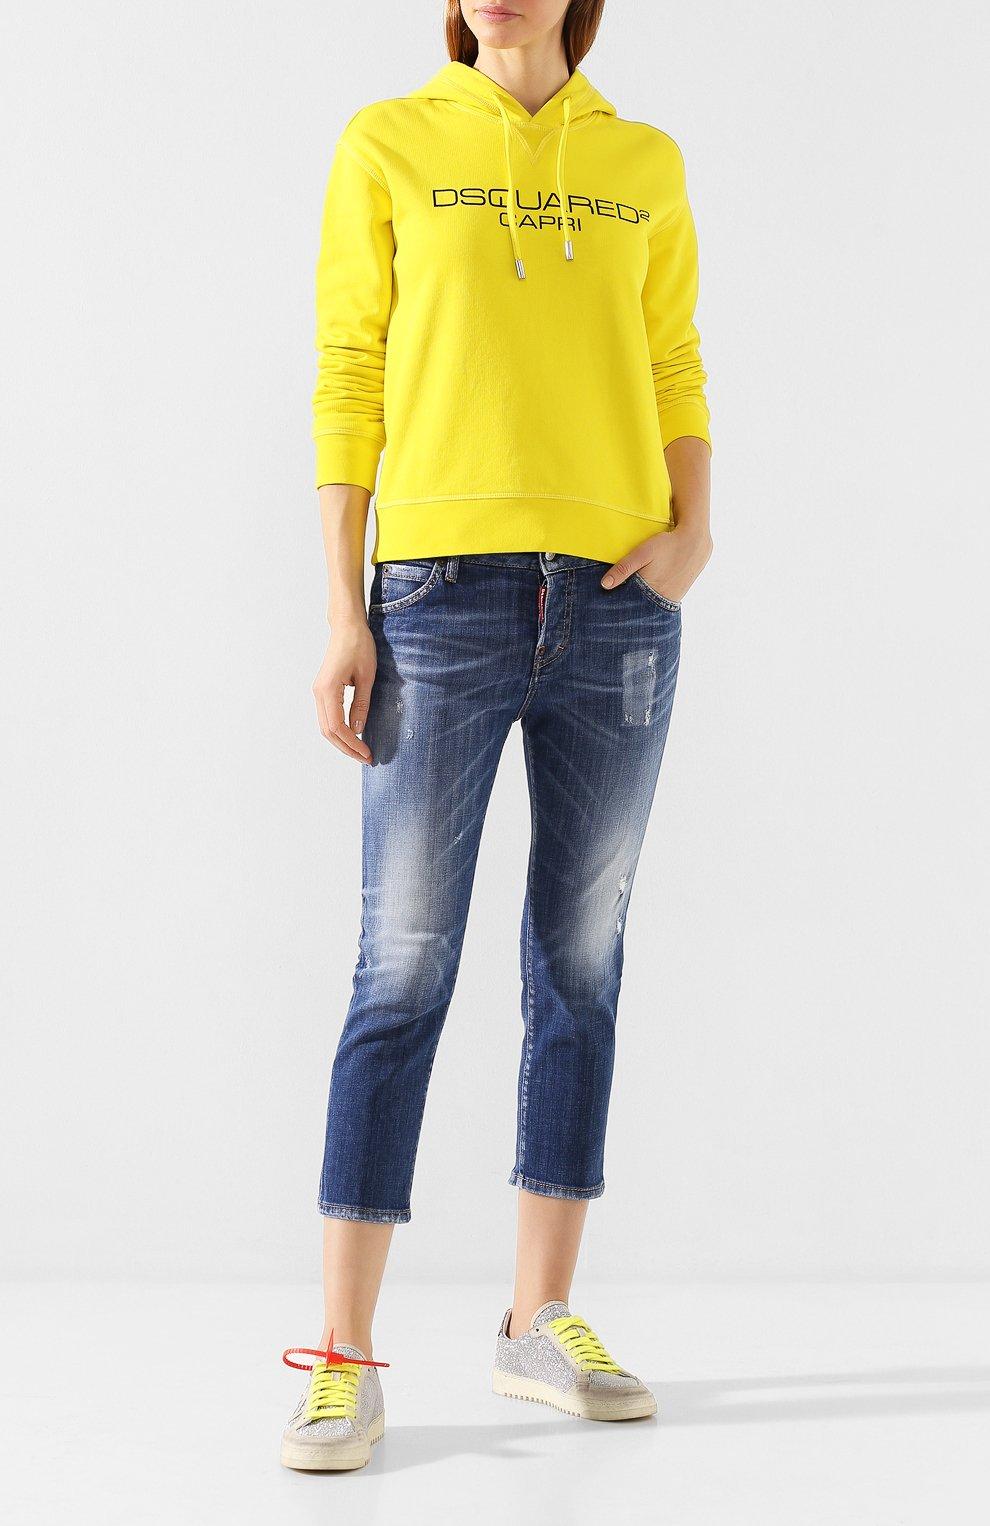 Женские джинсы DSQUARED2 синего цвета, арт. S75LB0322/S30342   Фото 2